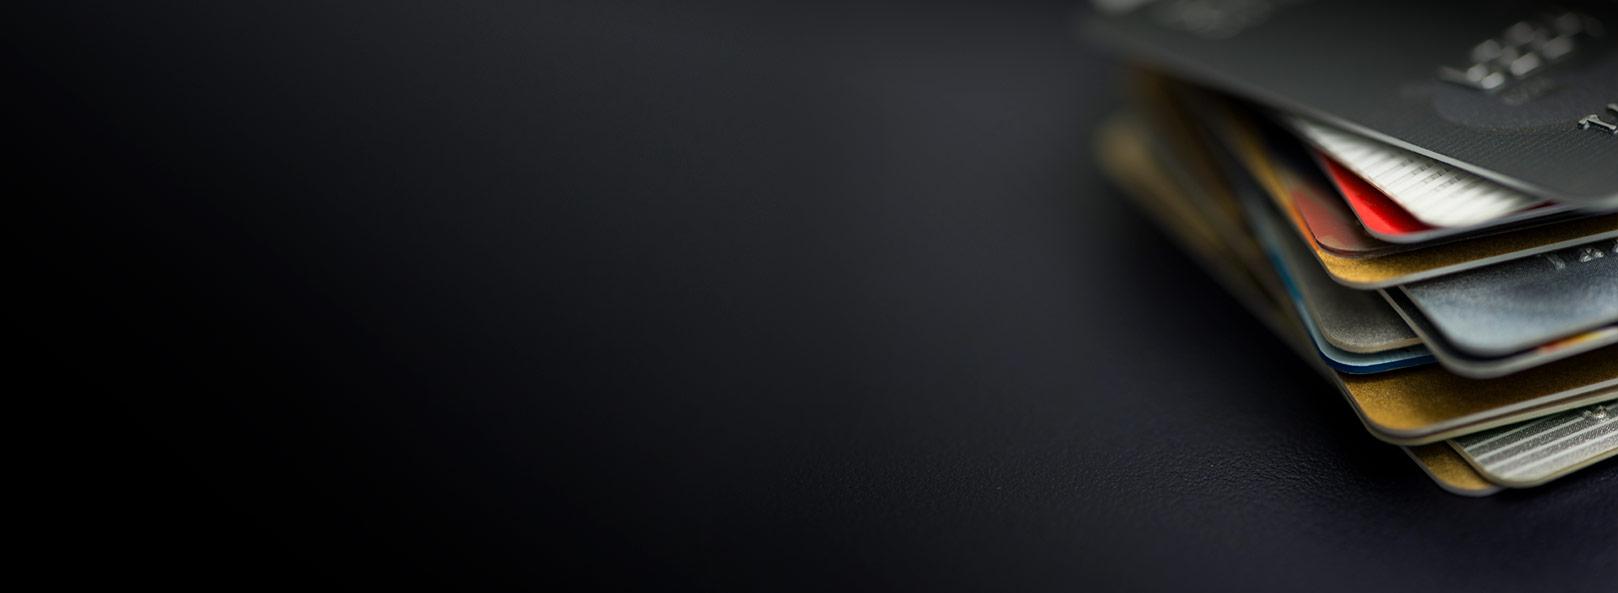 espacio-santander-bannerv3-tarjetas-revolving